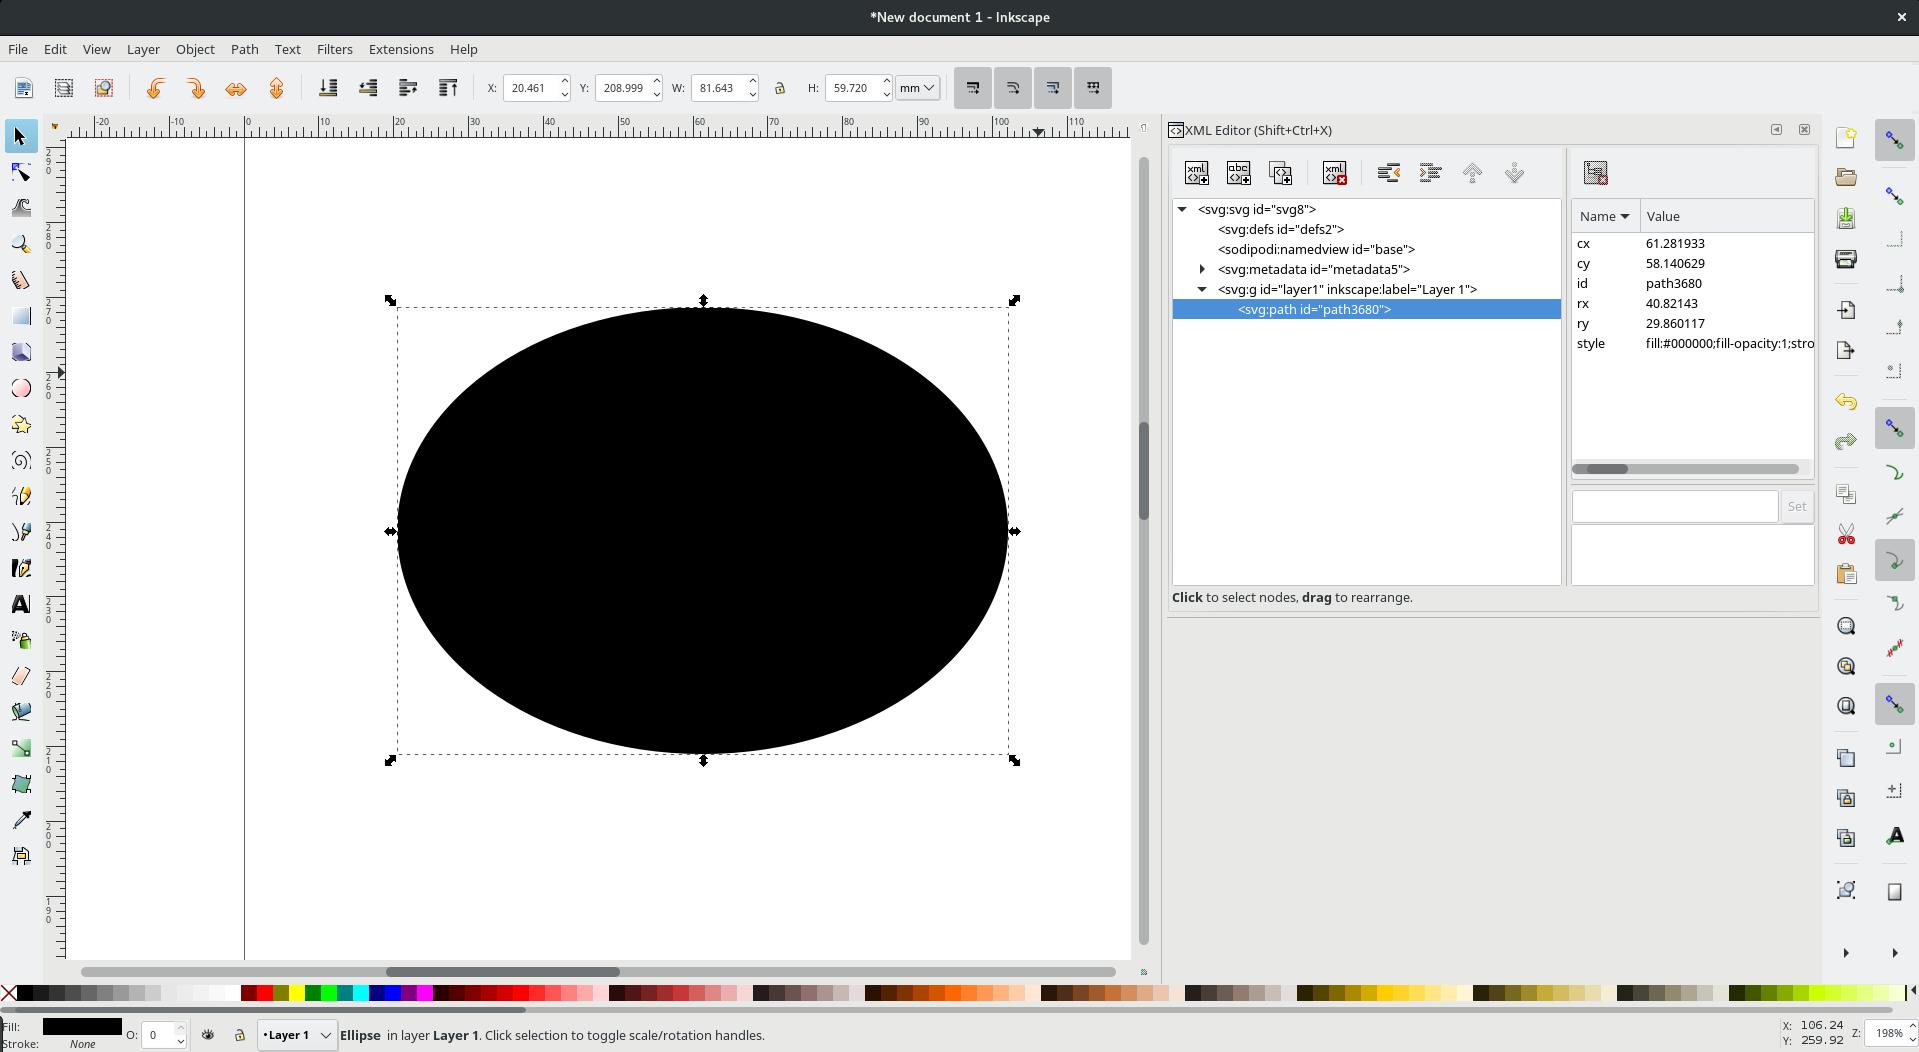 PZIyear2/images/inkscape-xml.png